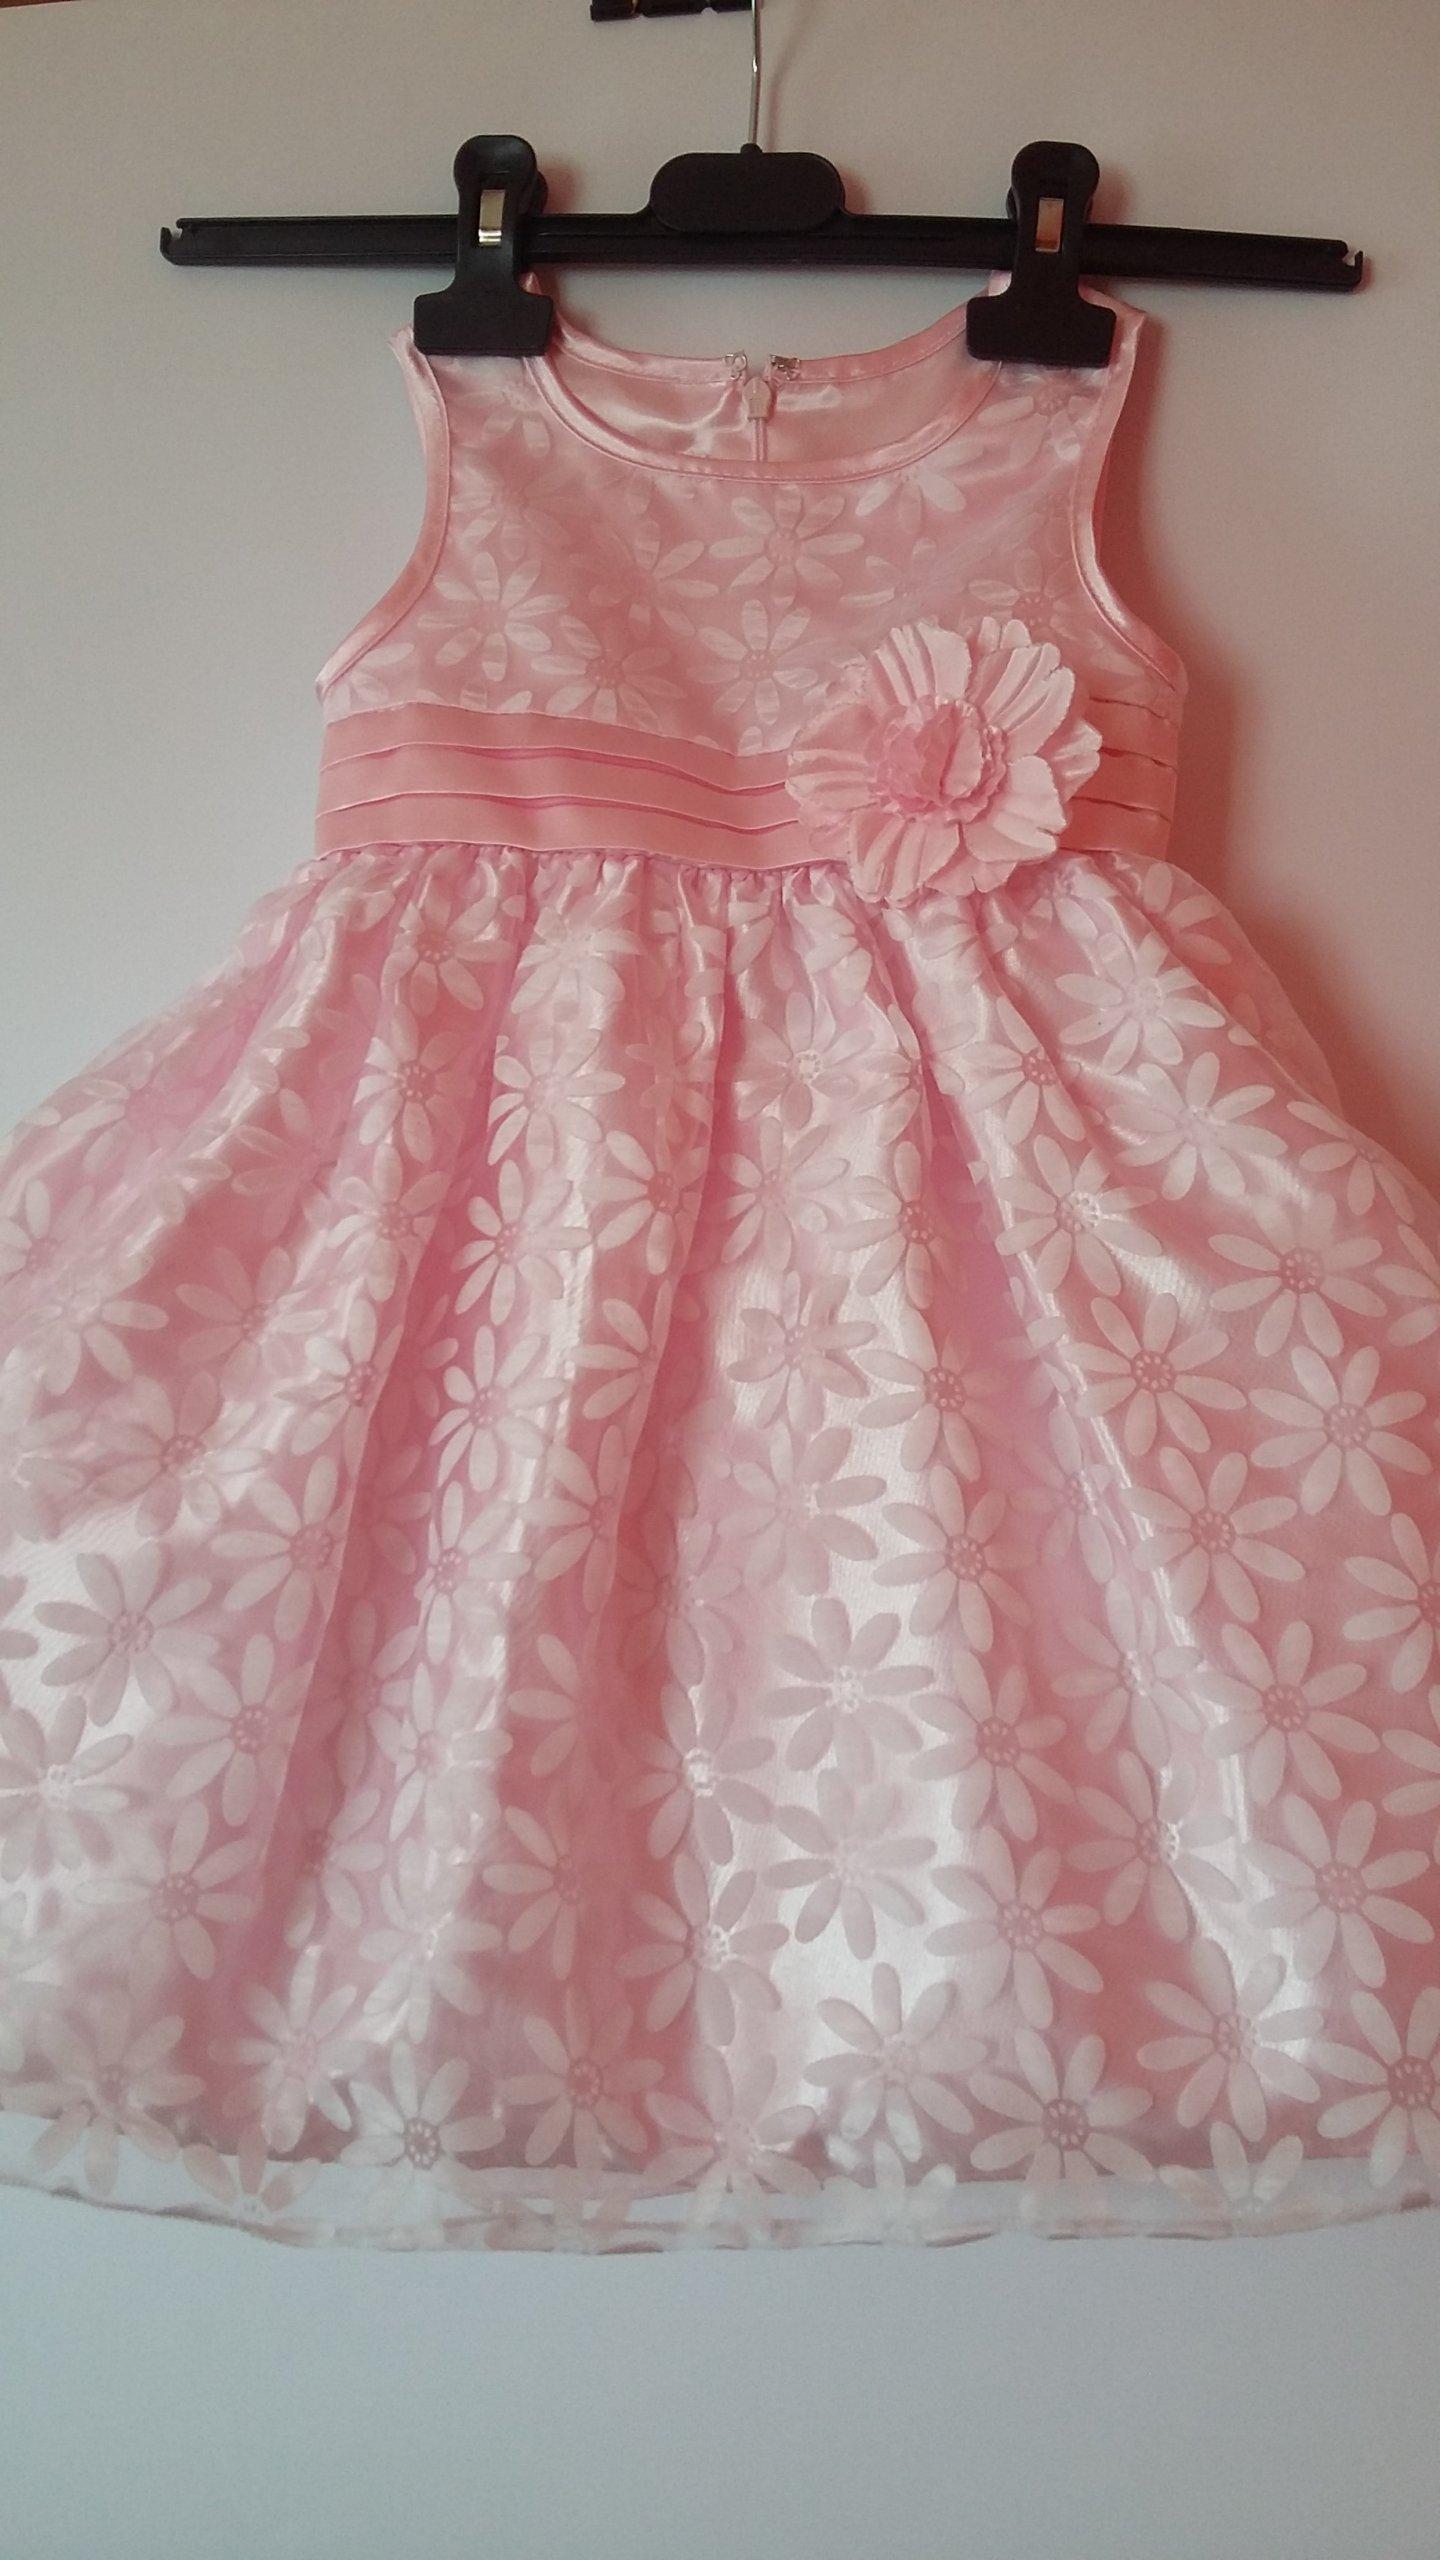 04add6e2c6 Sukienka Cinderella komunia wesele chrzest 86 92 - 7287804012 ...